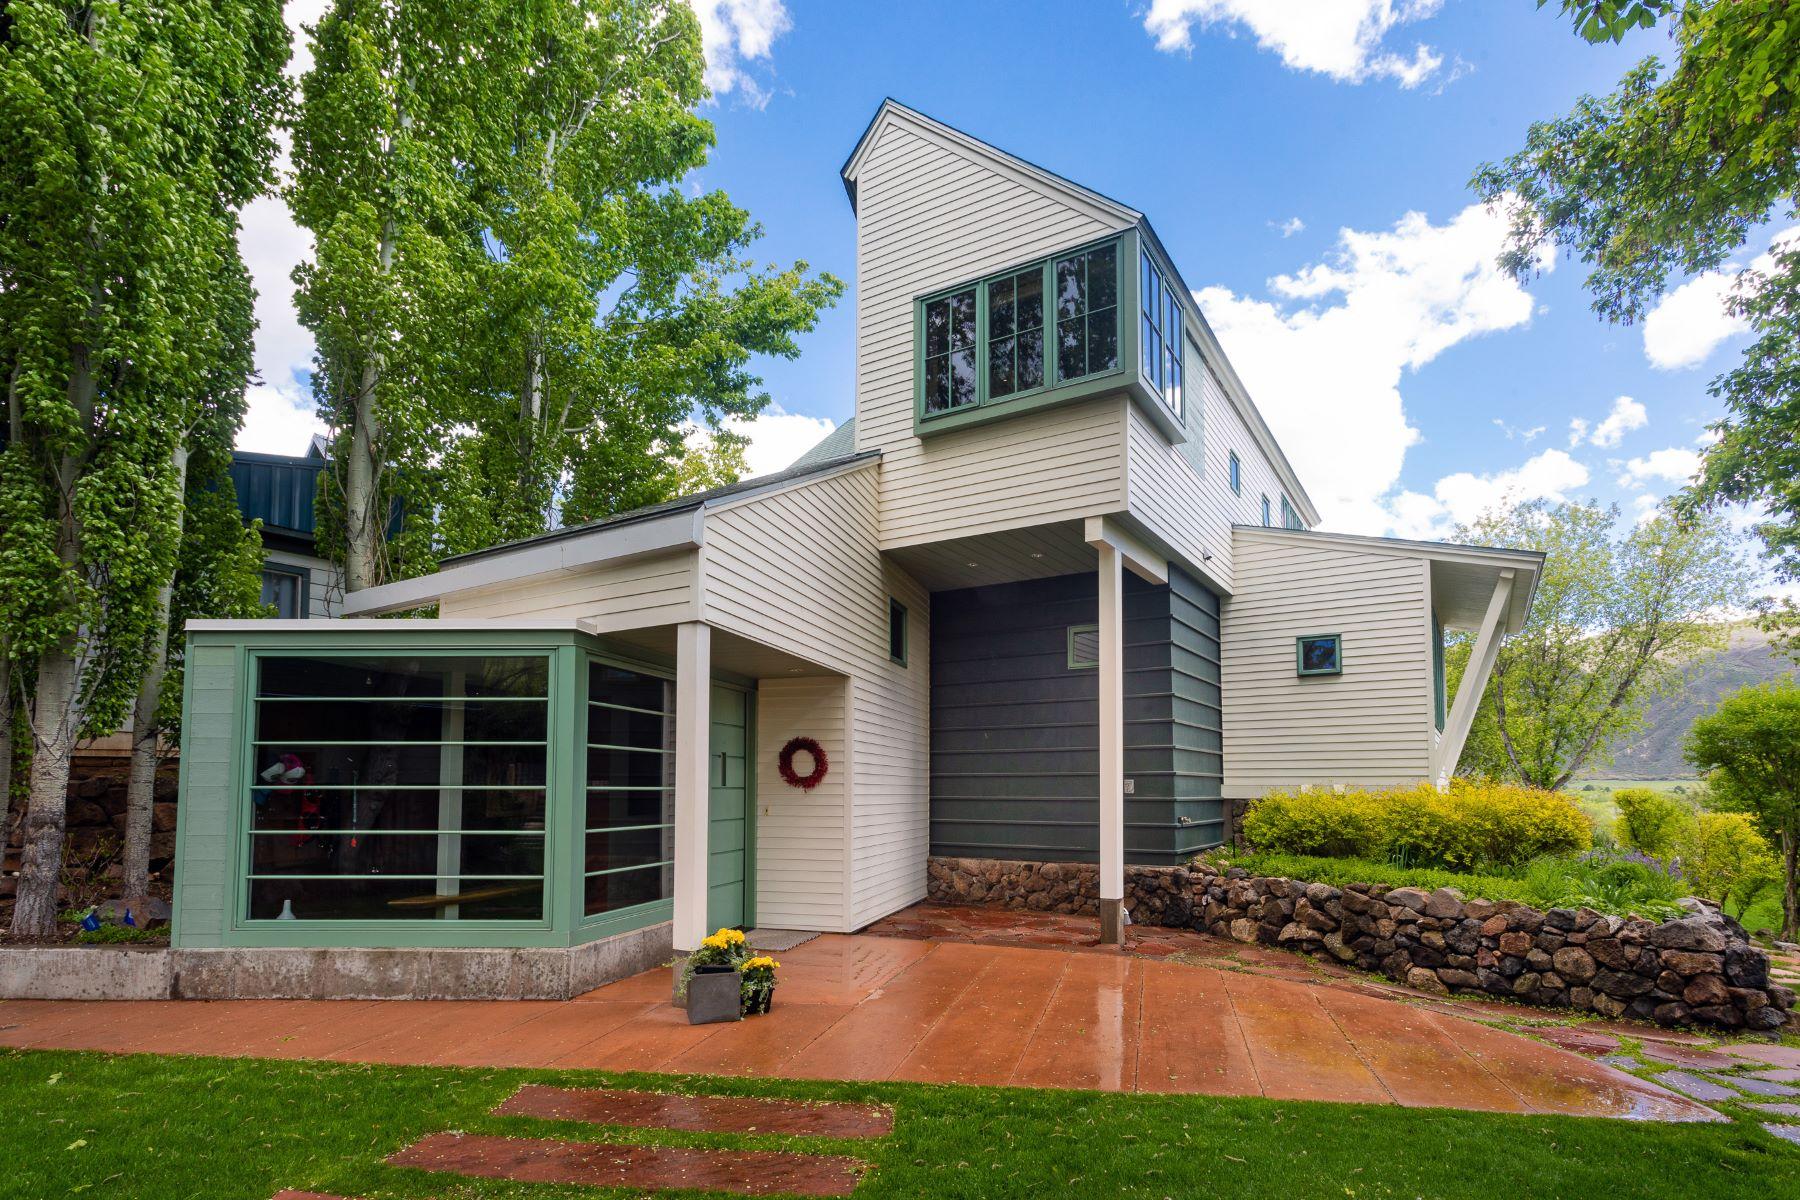 Single Family Homes for Sale at 313 & 315 E Sopris Drive Basalt, Colorado 81621 United States